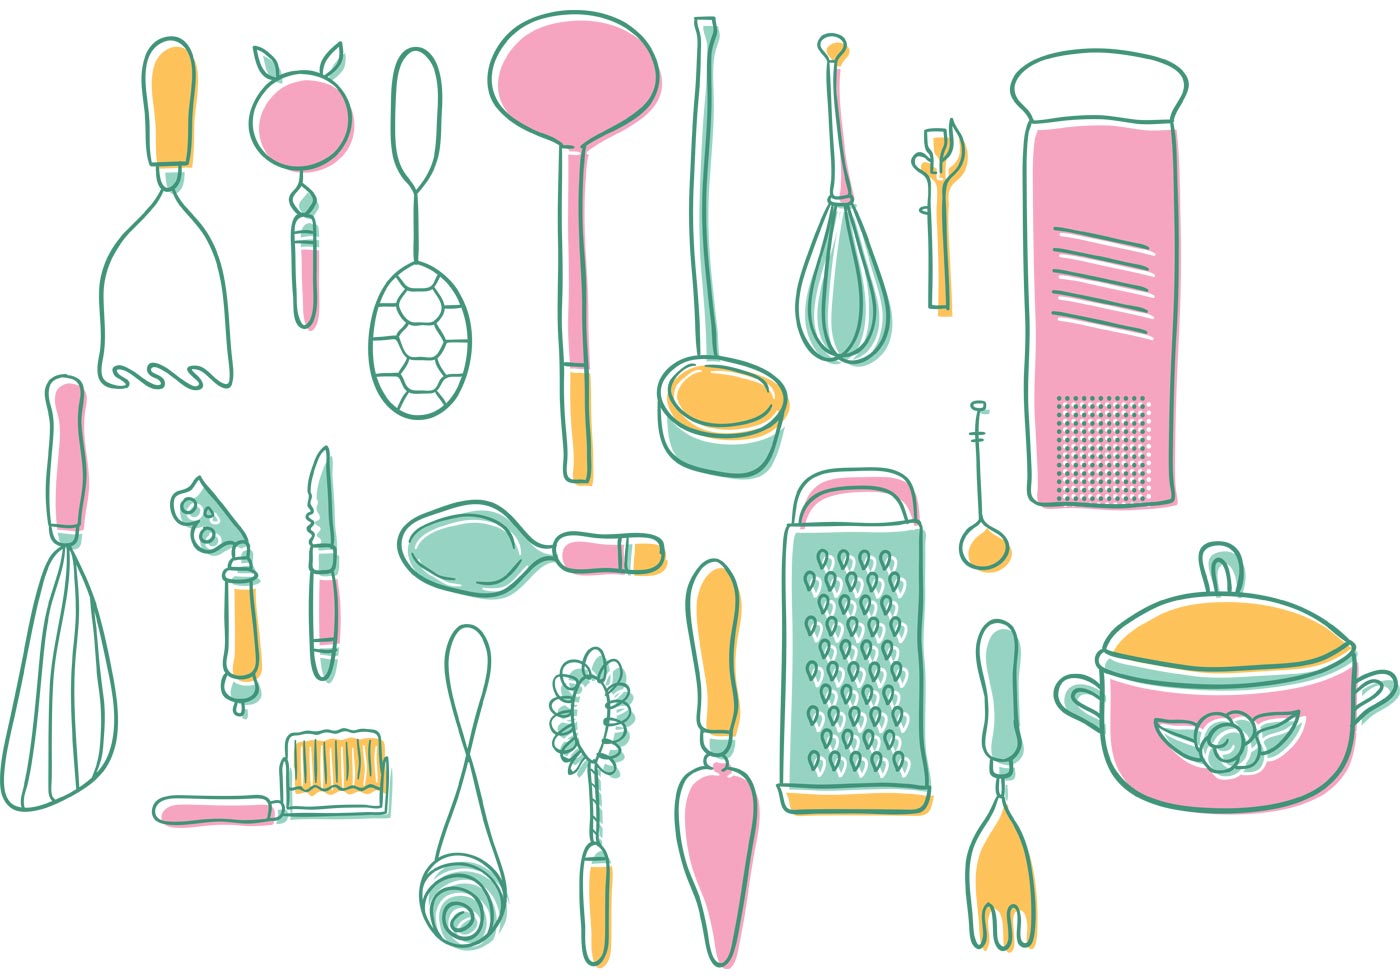 cute kitchen gadgets island with oven vintage utensils vectors download free vector